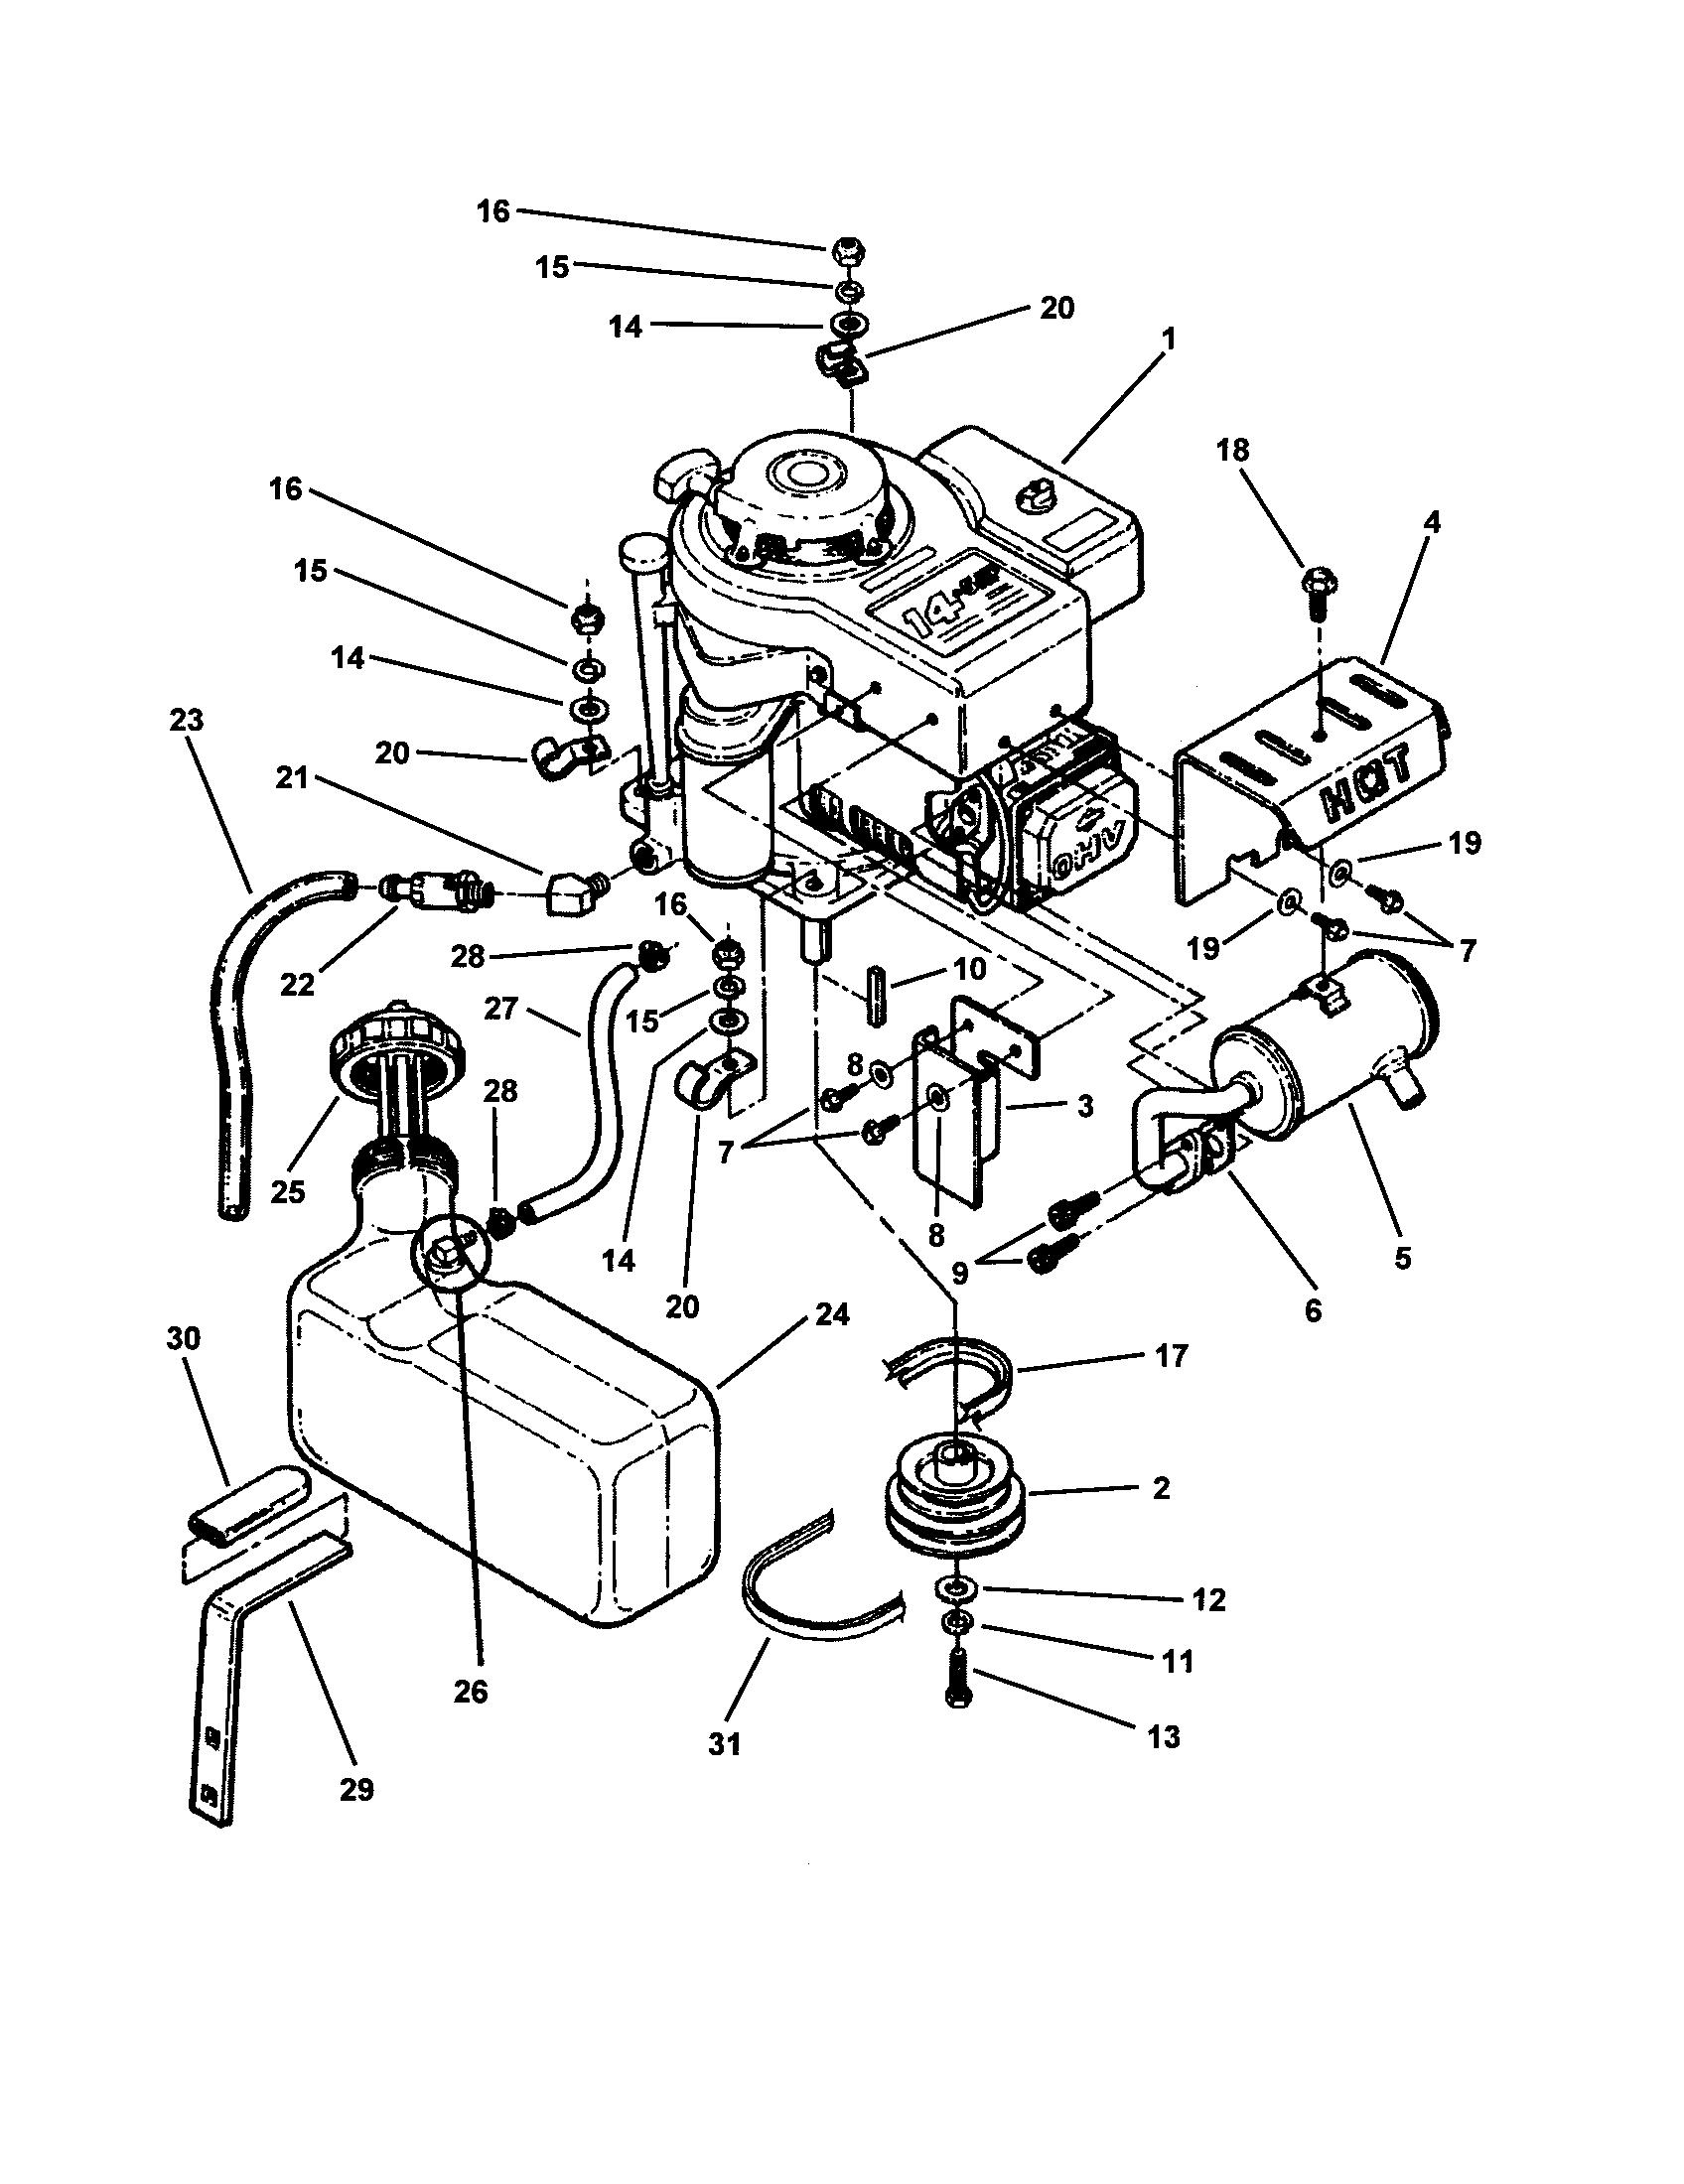 Wiring Diagram: 33 Snapper Riding Mower Parts Diagram